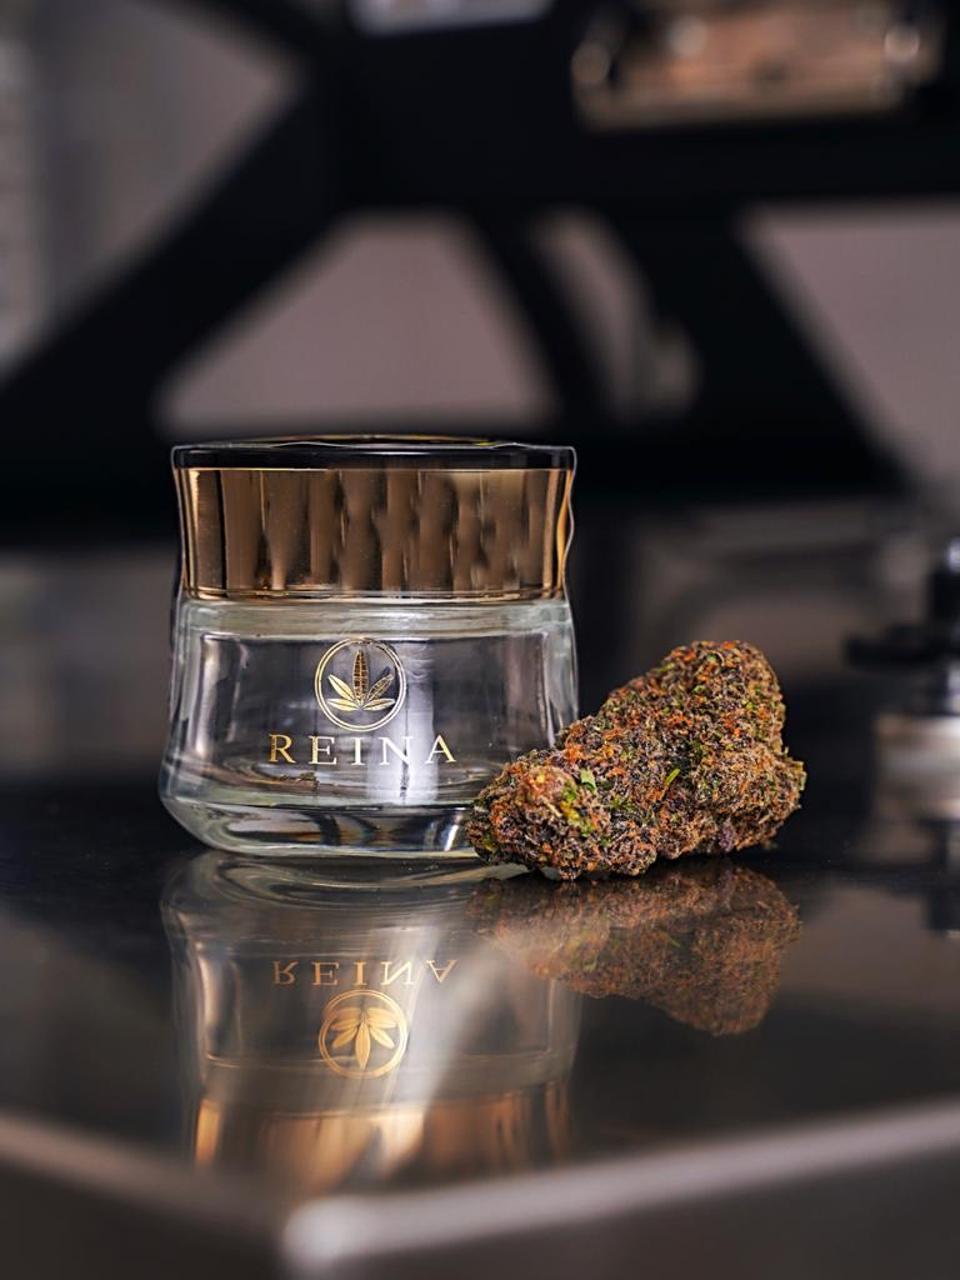 Reina ultra-luxe cannabis